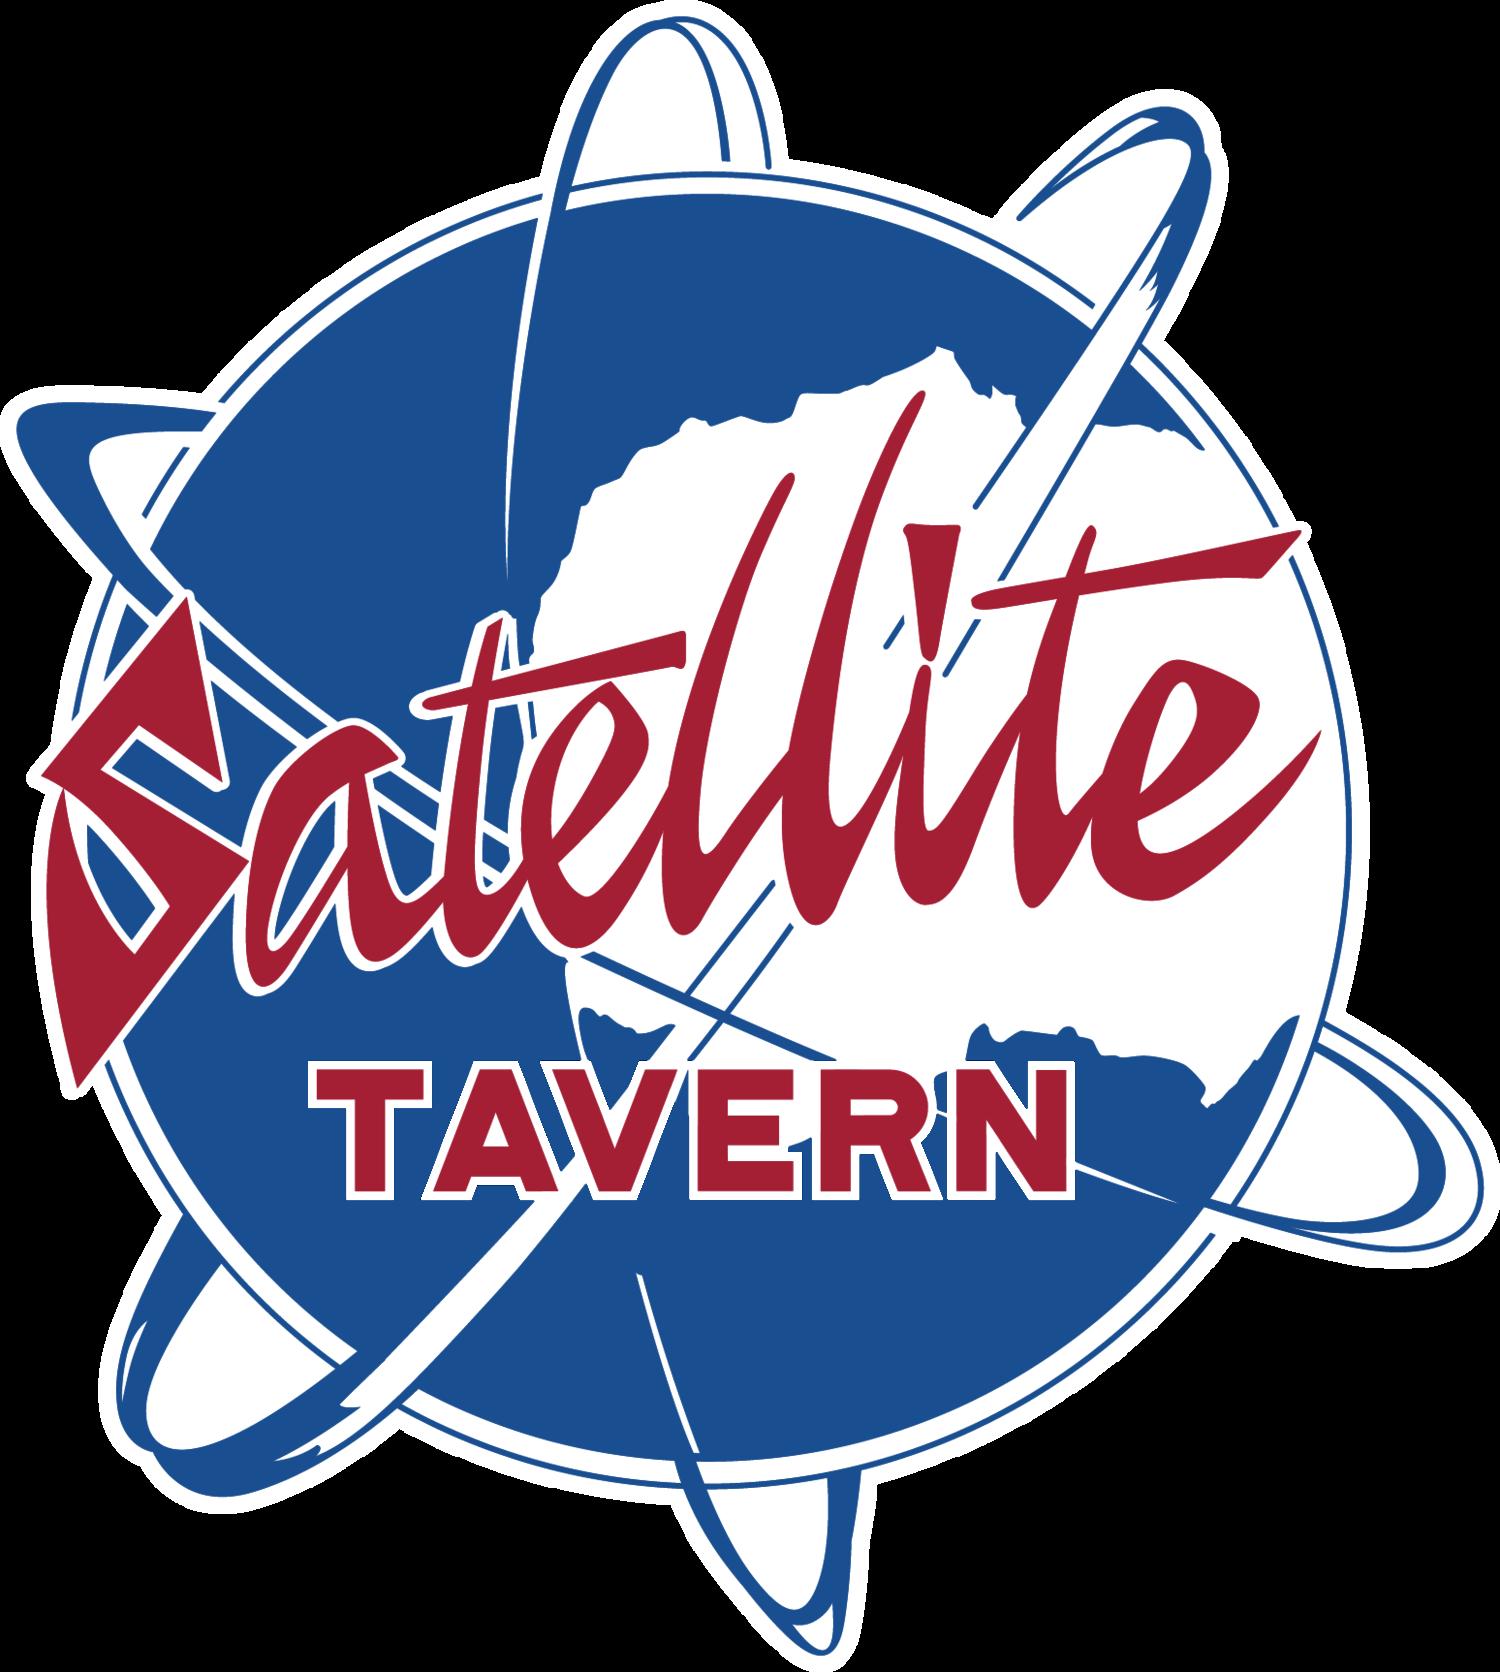 Satellite Tavern